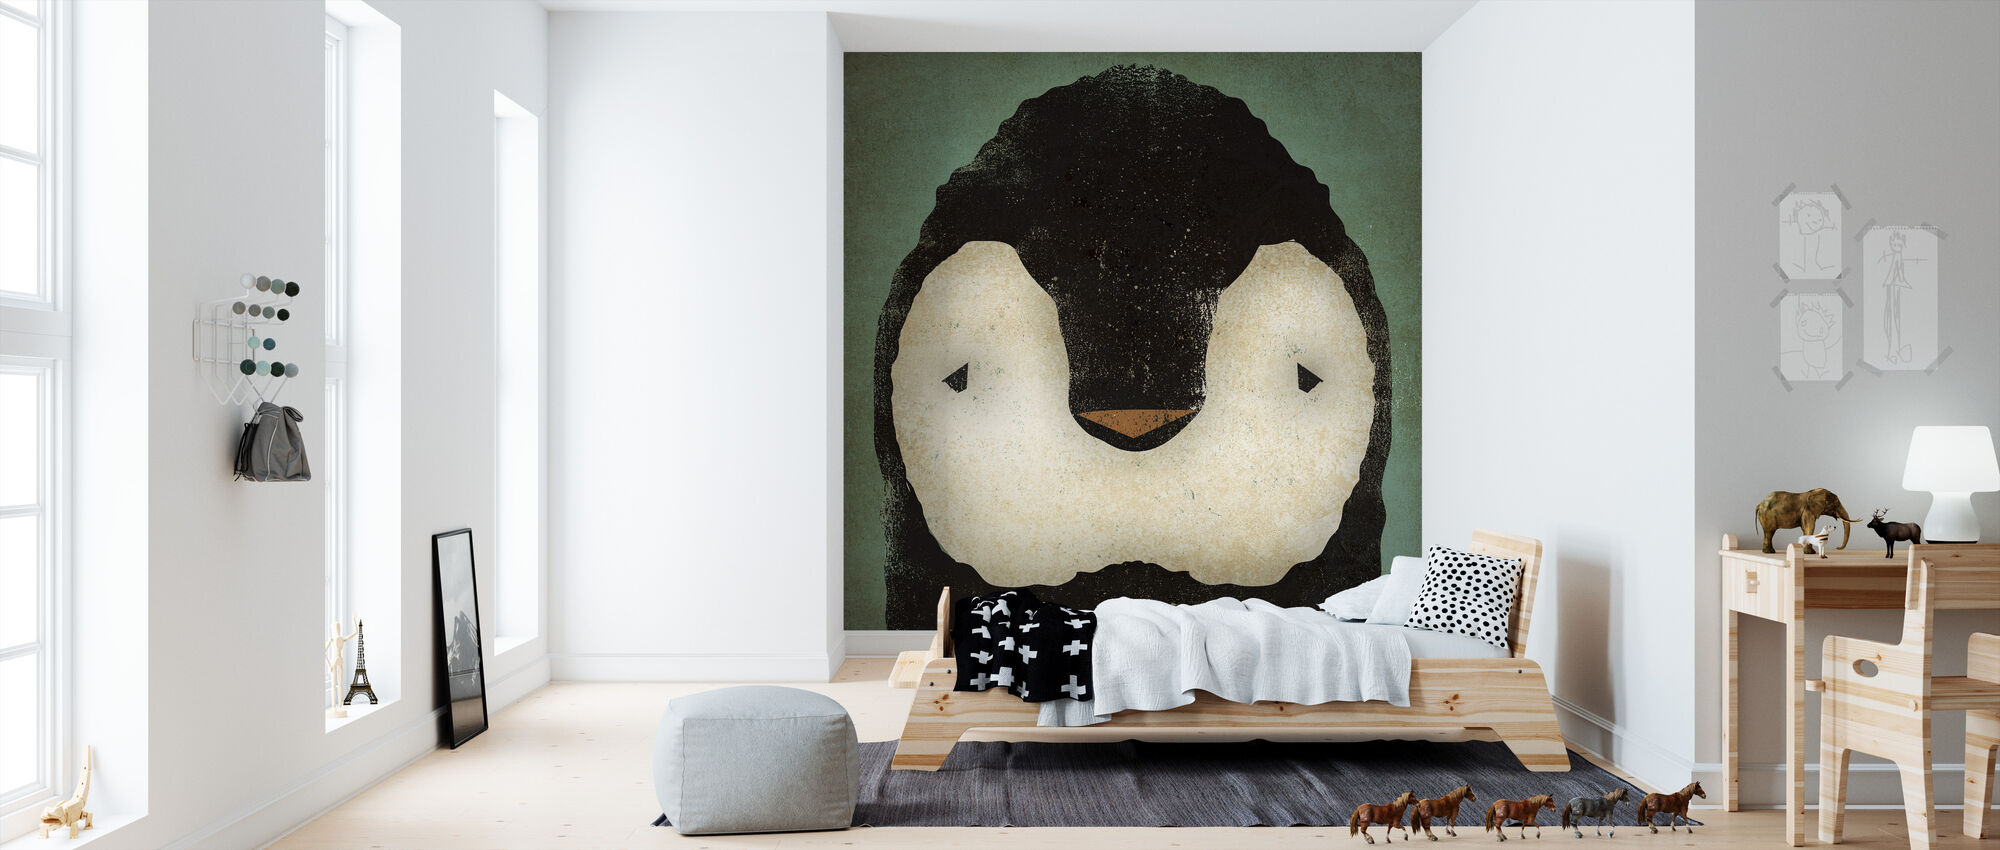 Baby Pinguïn - Behang - Kinderkamer